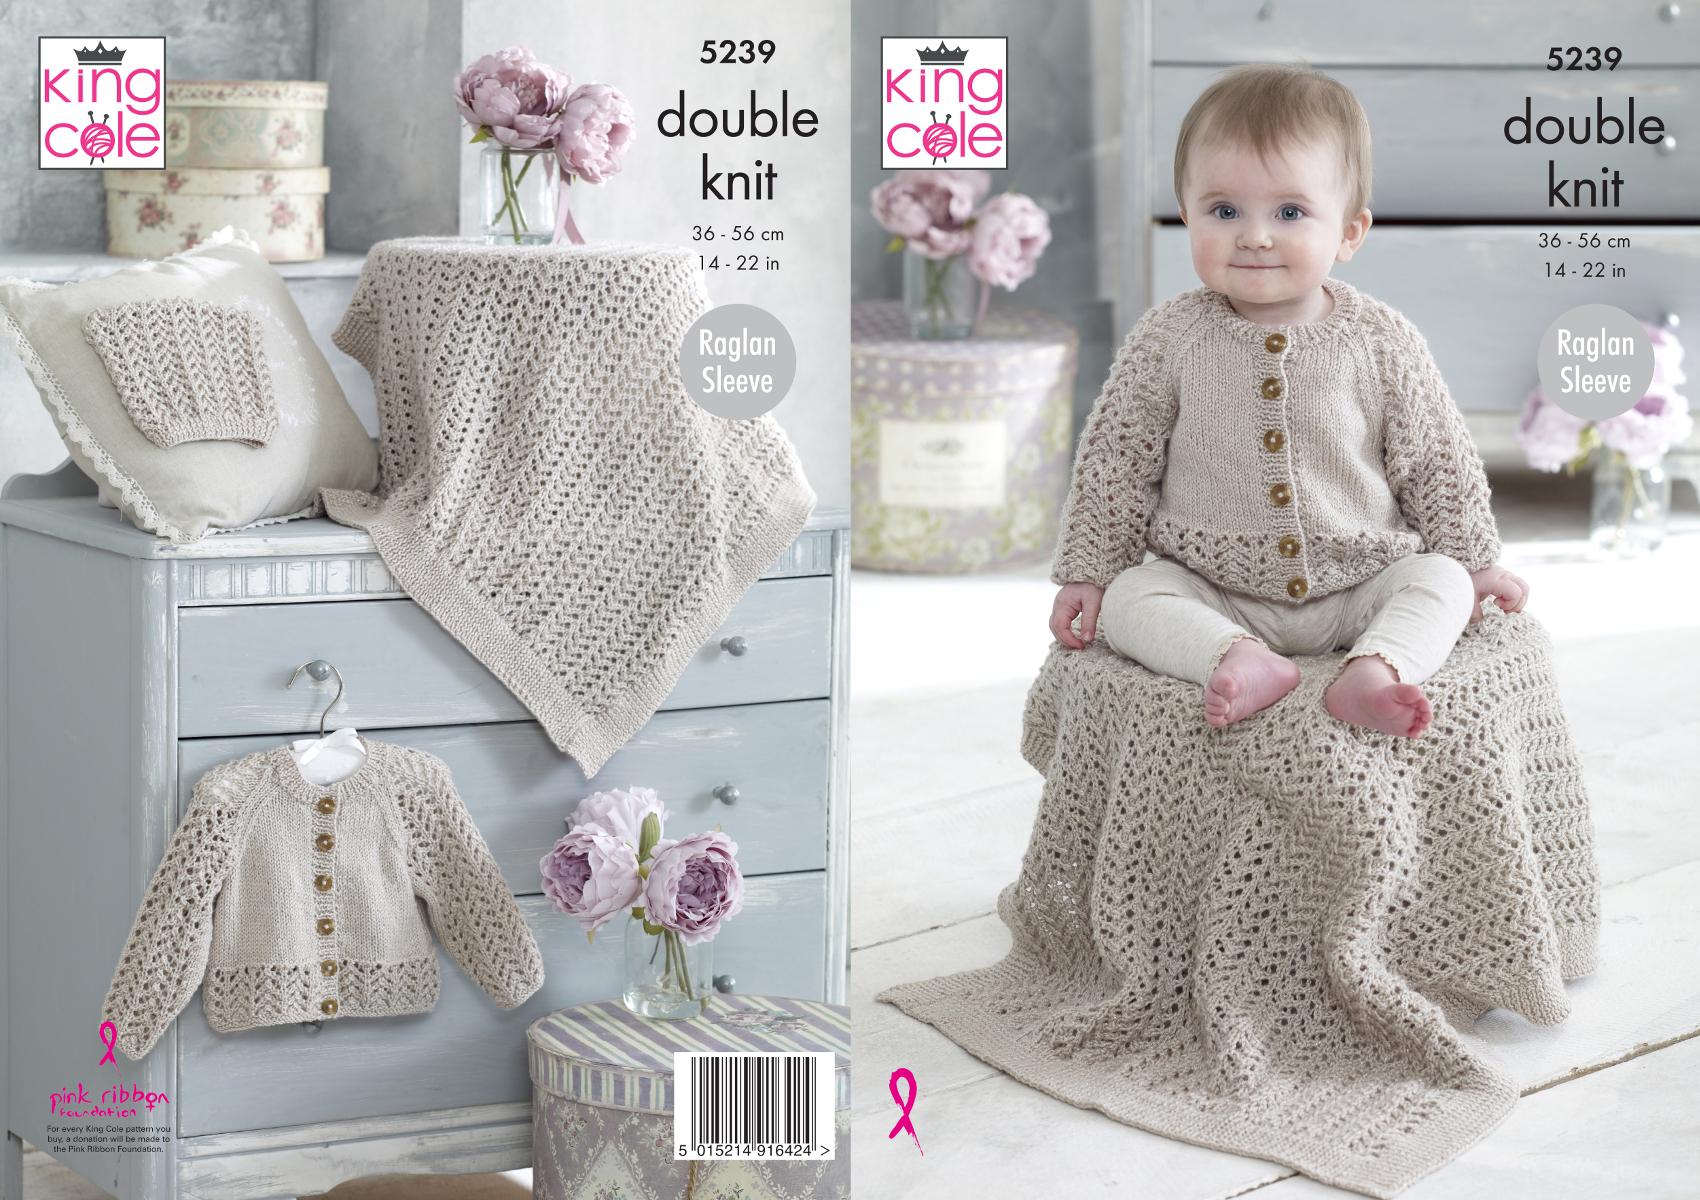 Baby Knitting Pattern Lacy Raglan Sleeve Sweater /& Cardigans King Cole DK 4917